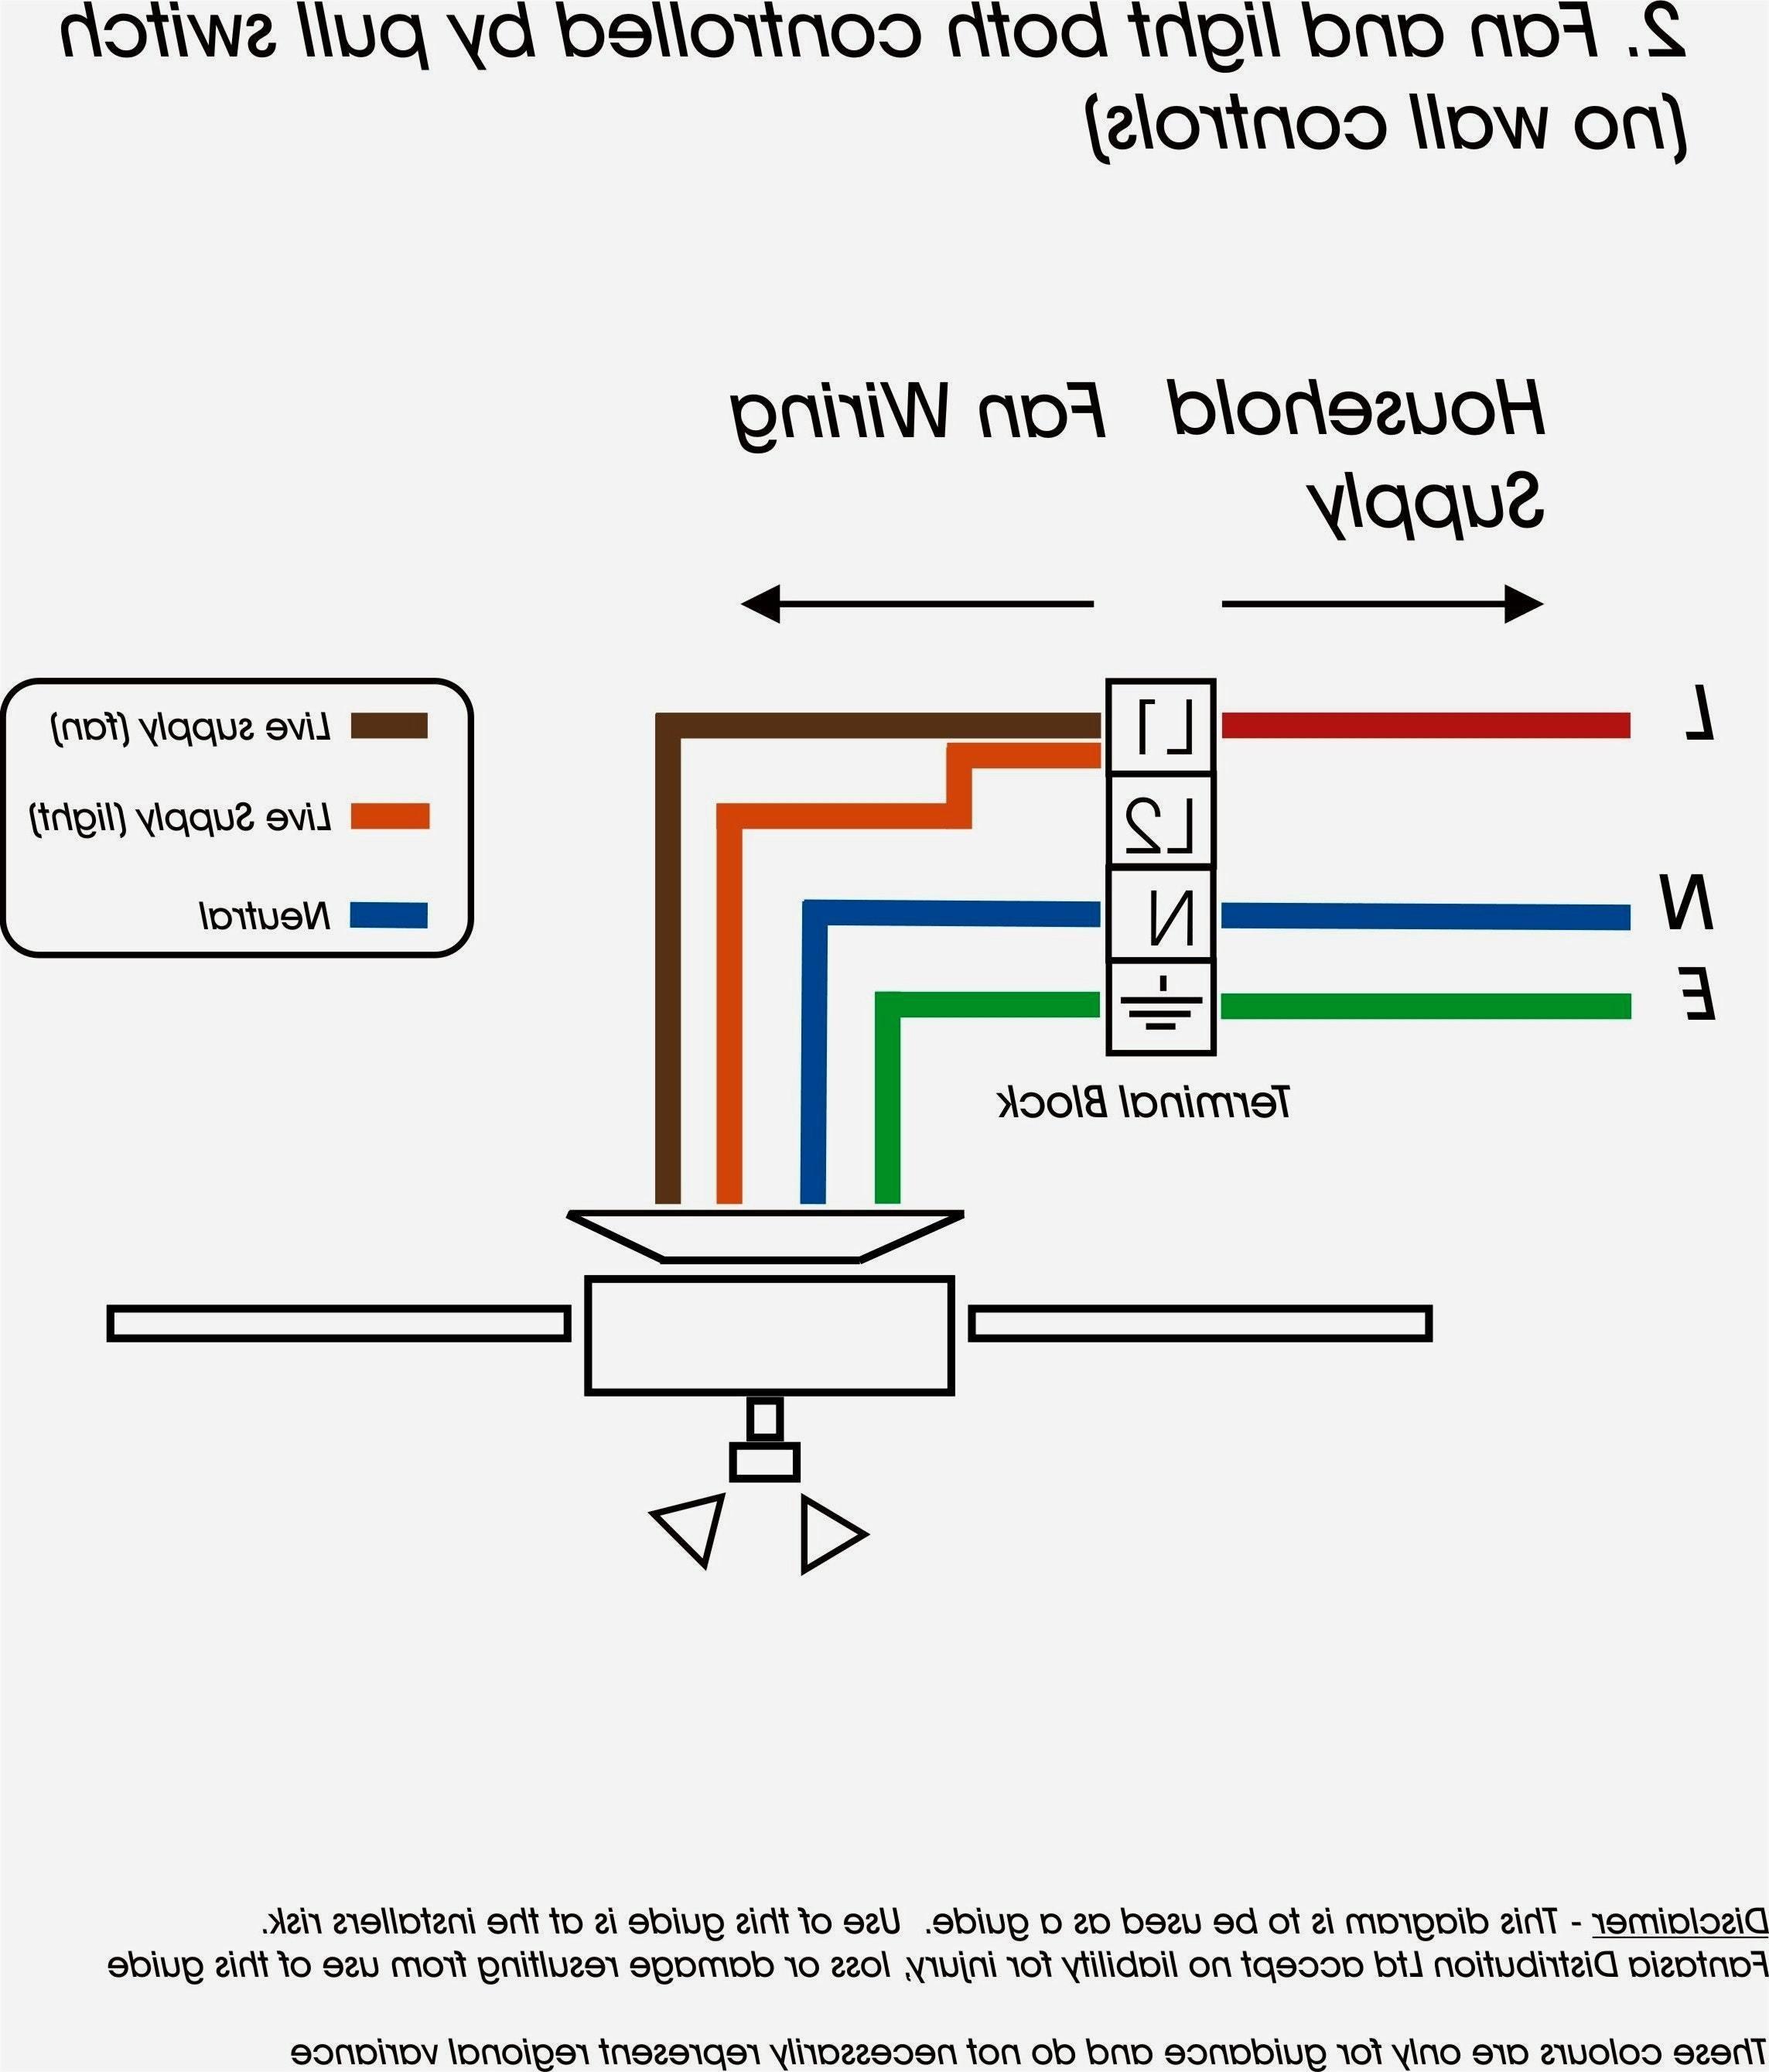 Telephone Wiring Diagram Australia Save Standard Light Switch Wiring Awesome 2 Way Light Switch Wiring